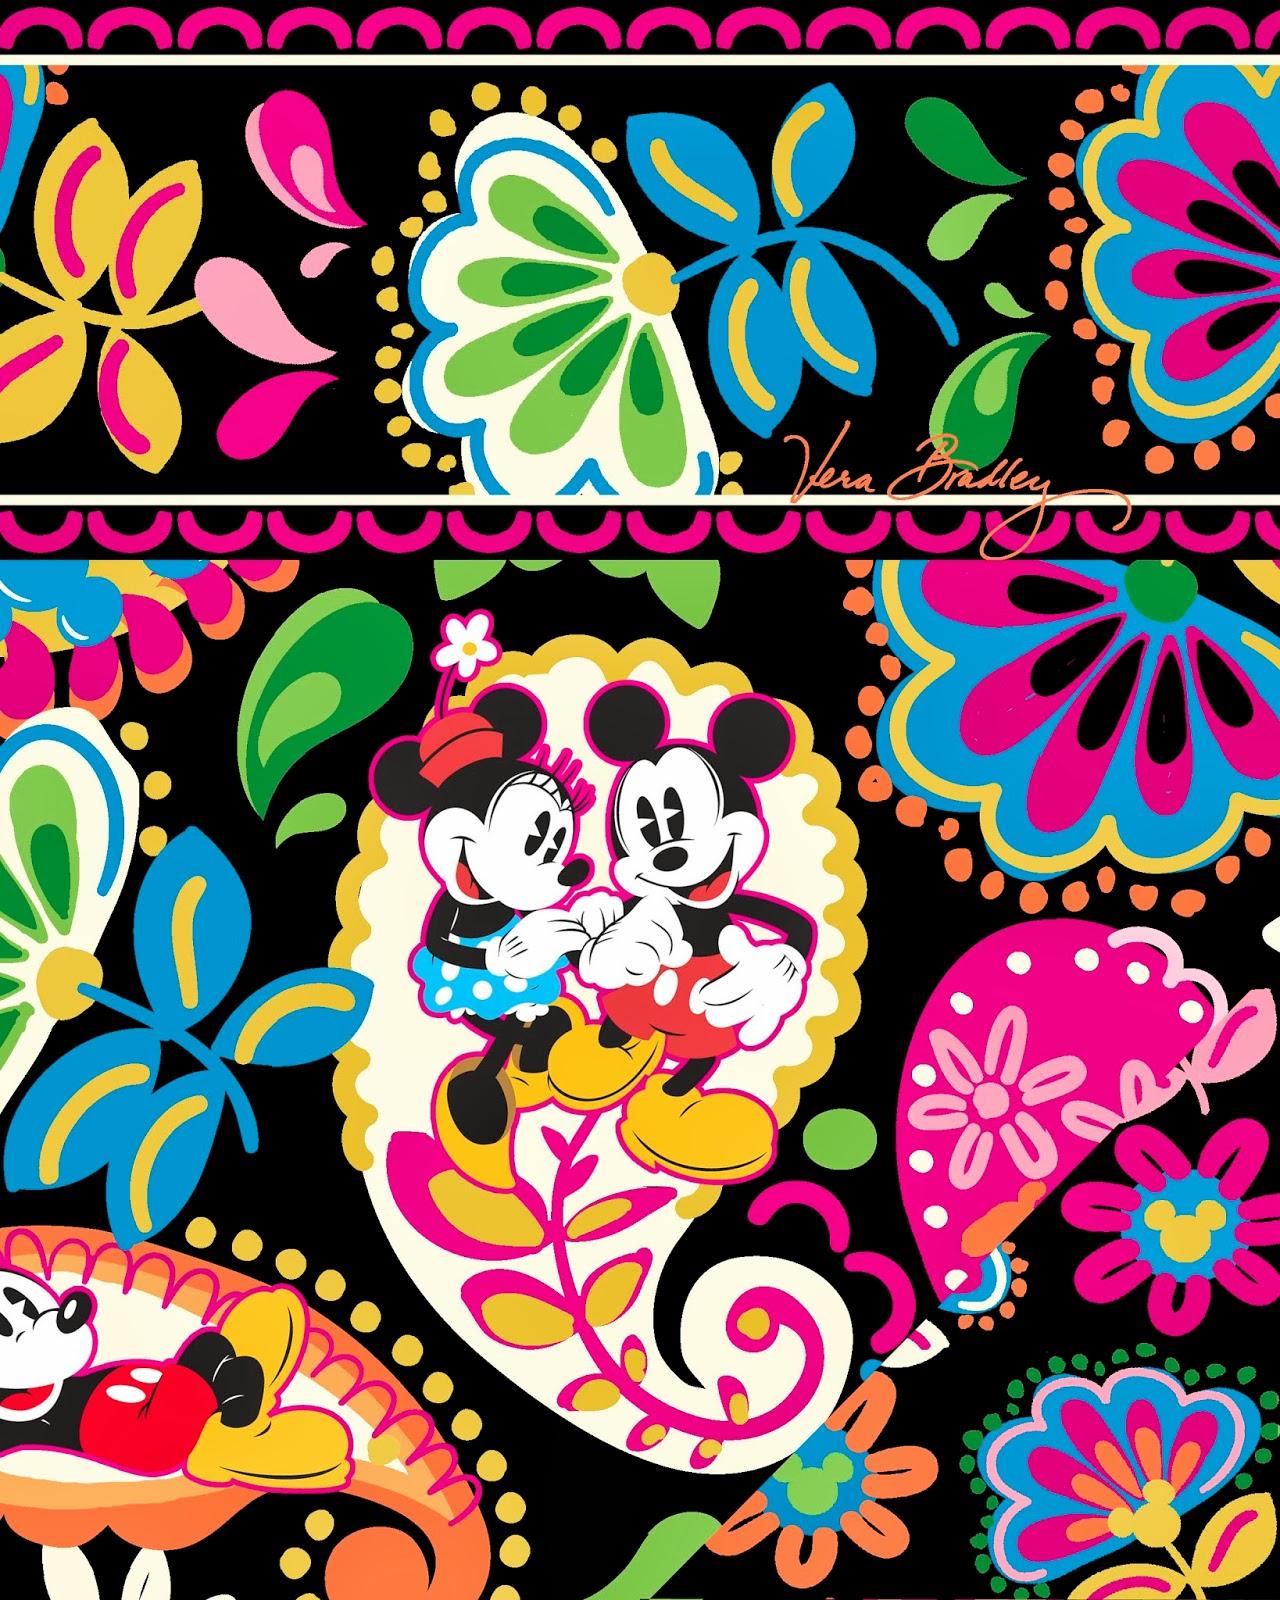 48 Disney Vera Bradley Wallpaper On Wallpapersafari